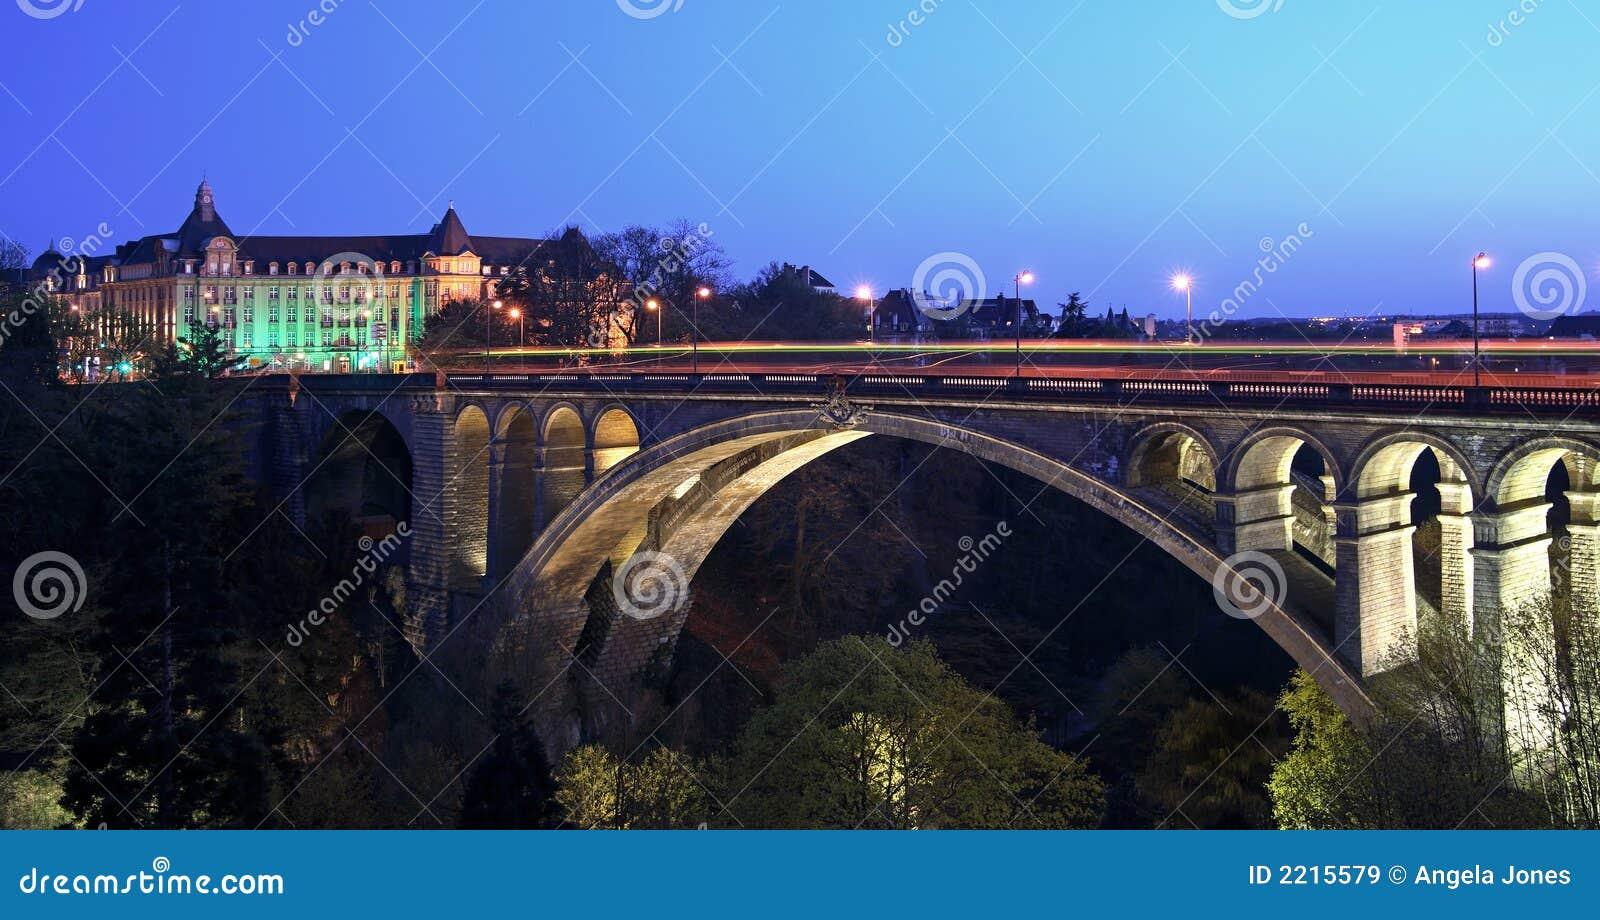 pont adolphe bridge luxembourg stock image image 2215579. Black Bedroom Furniture Sets. Home Design Ideas